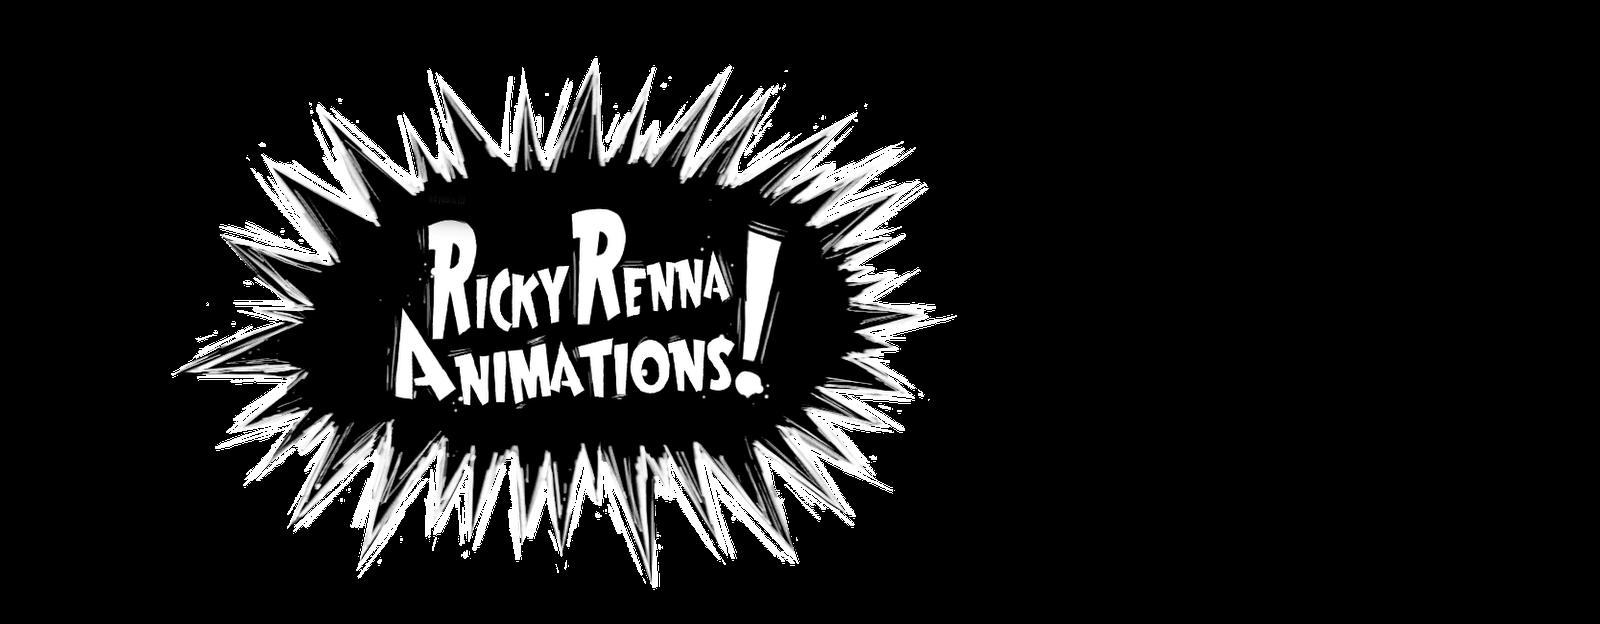 Ricky Renna Animations!